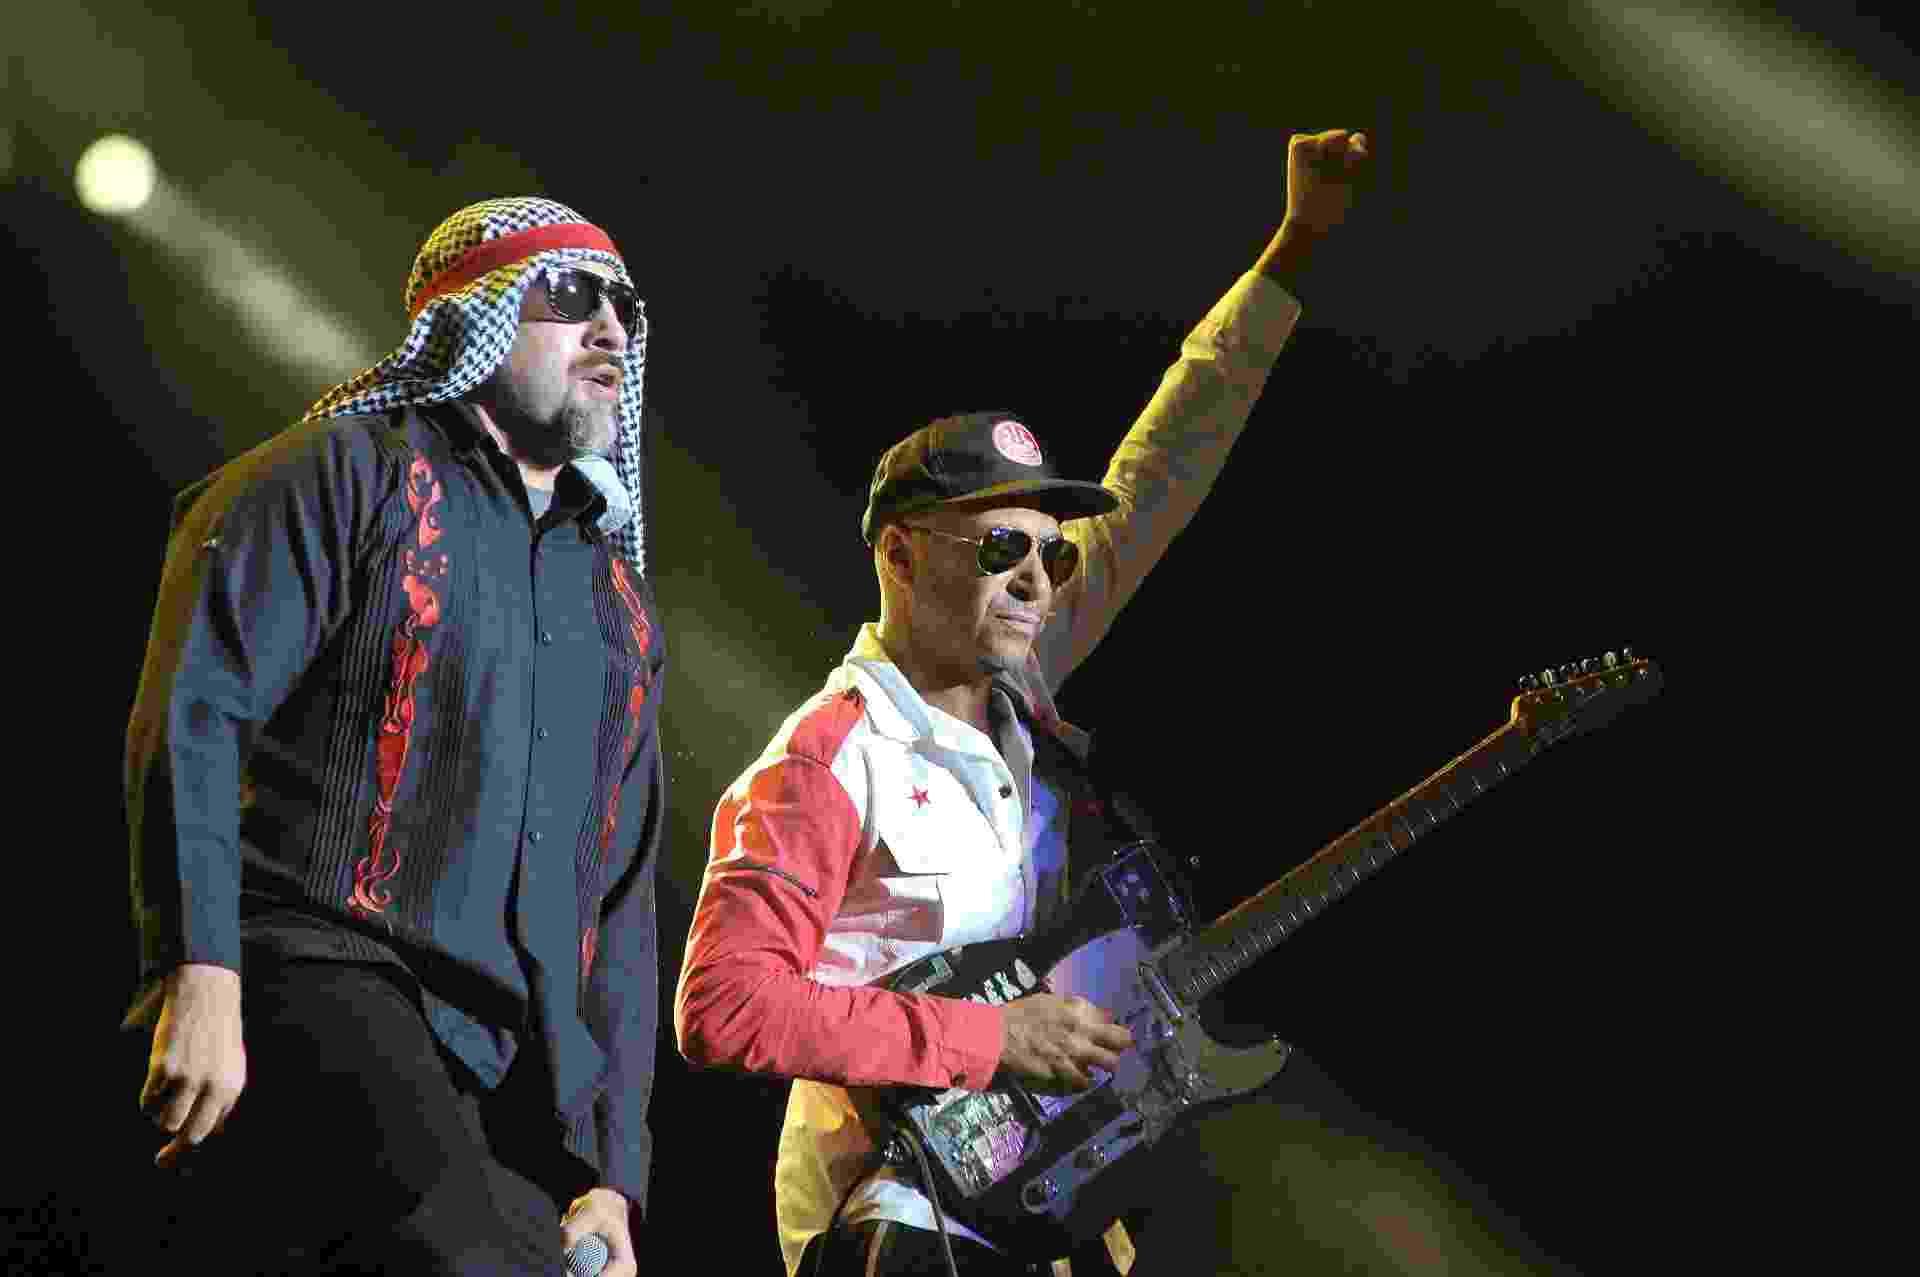 Supergrupo Prophets of Rage se apresenta em Interlagos - Reinaldo Canato/UOL